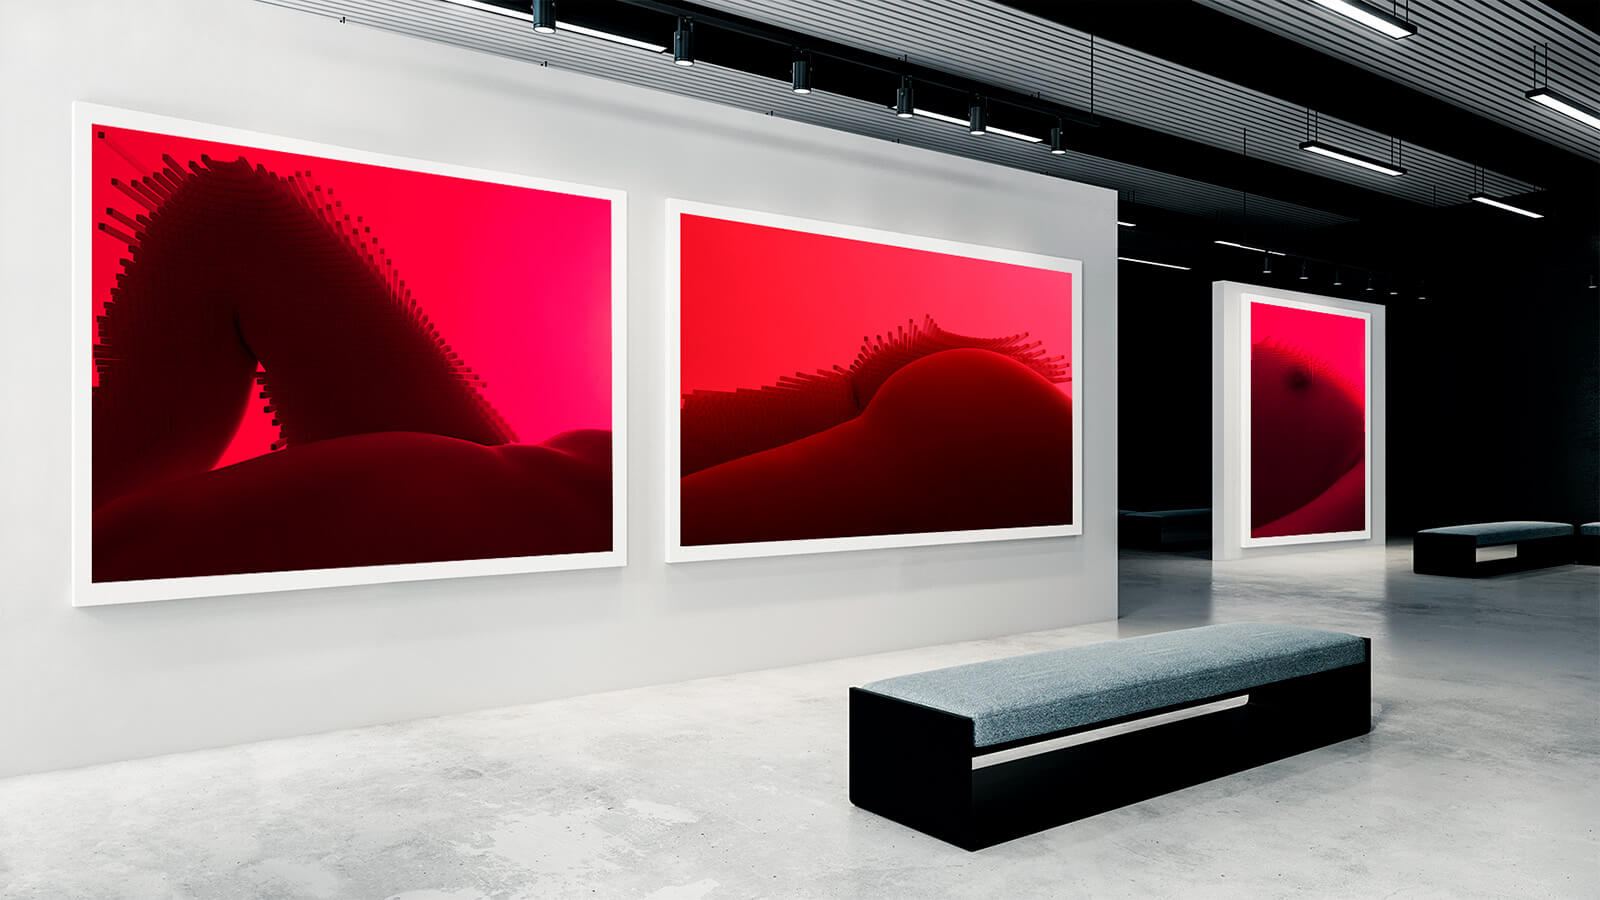 Hummo-reconstruction-exposicion-Horno-Virtual-Gallery-galeria-arte-fotografia-artistica-edicion-limitada-decoracion-leg-ass-breast